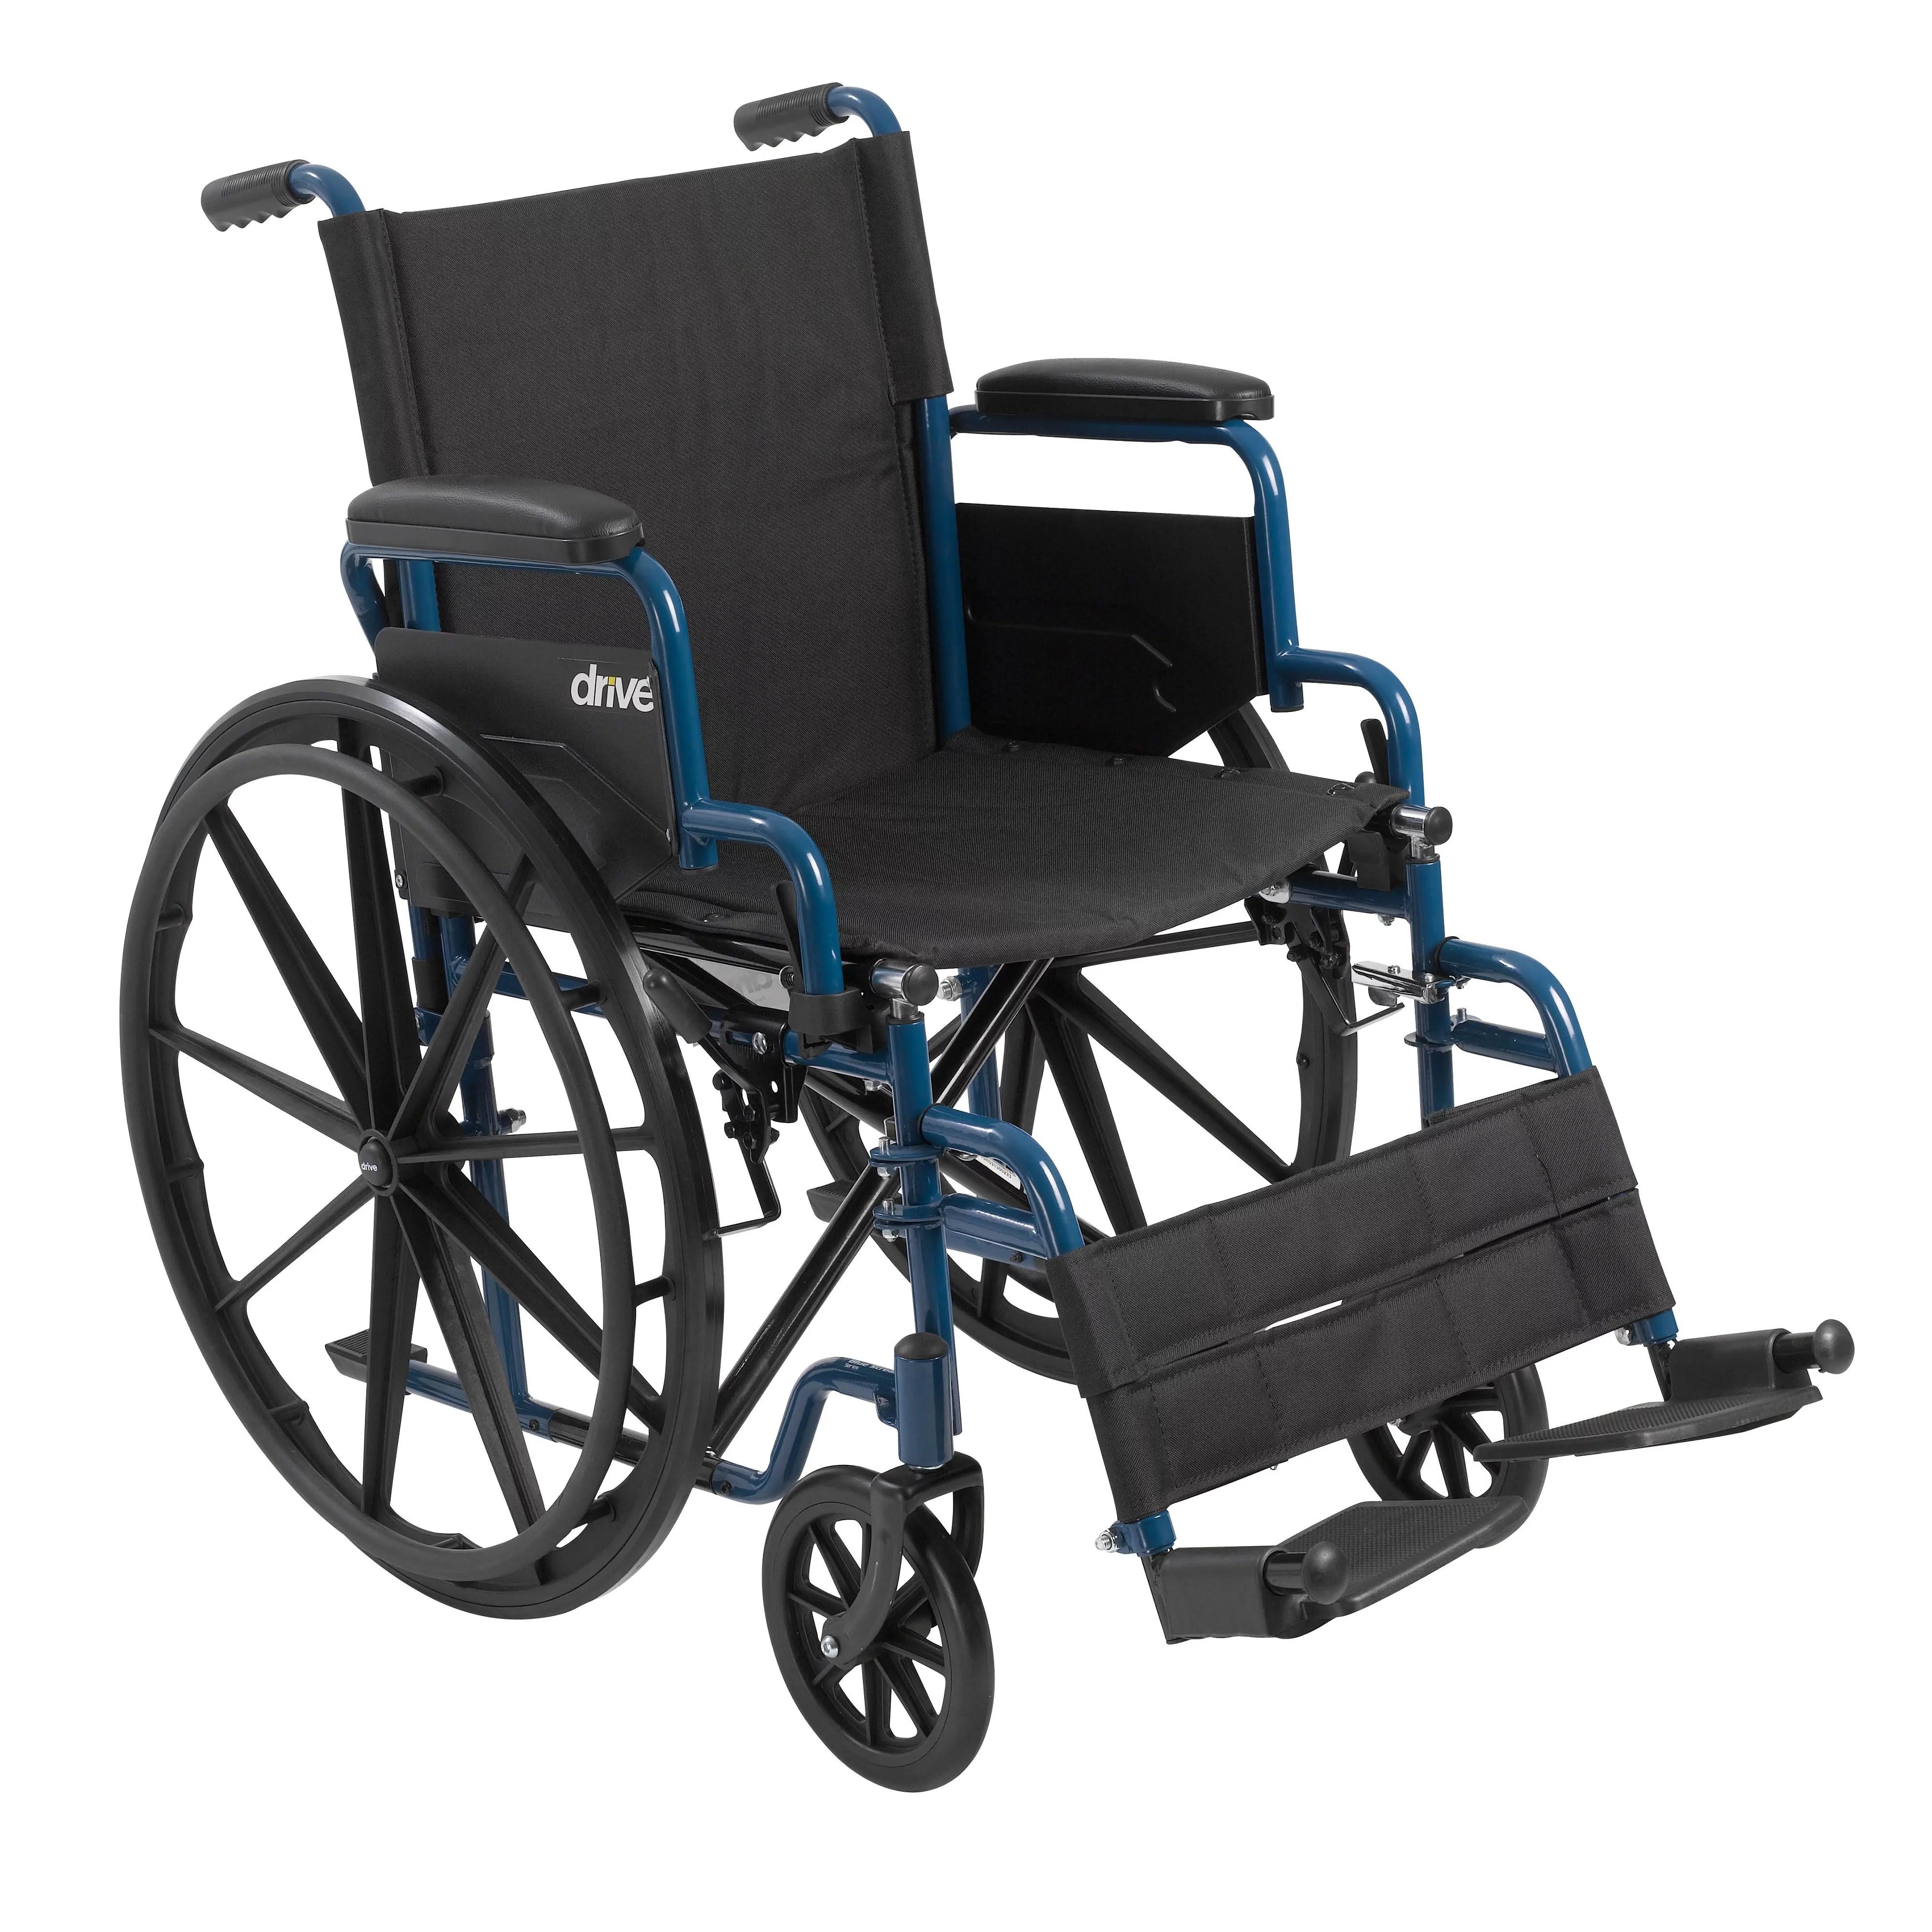 drive wheel chair best chairs swivel glider medical blue streak wheelchair with flip back desk arms swing away footrests 18 seat walmart com